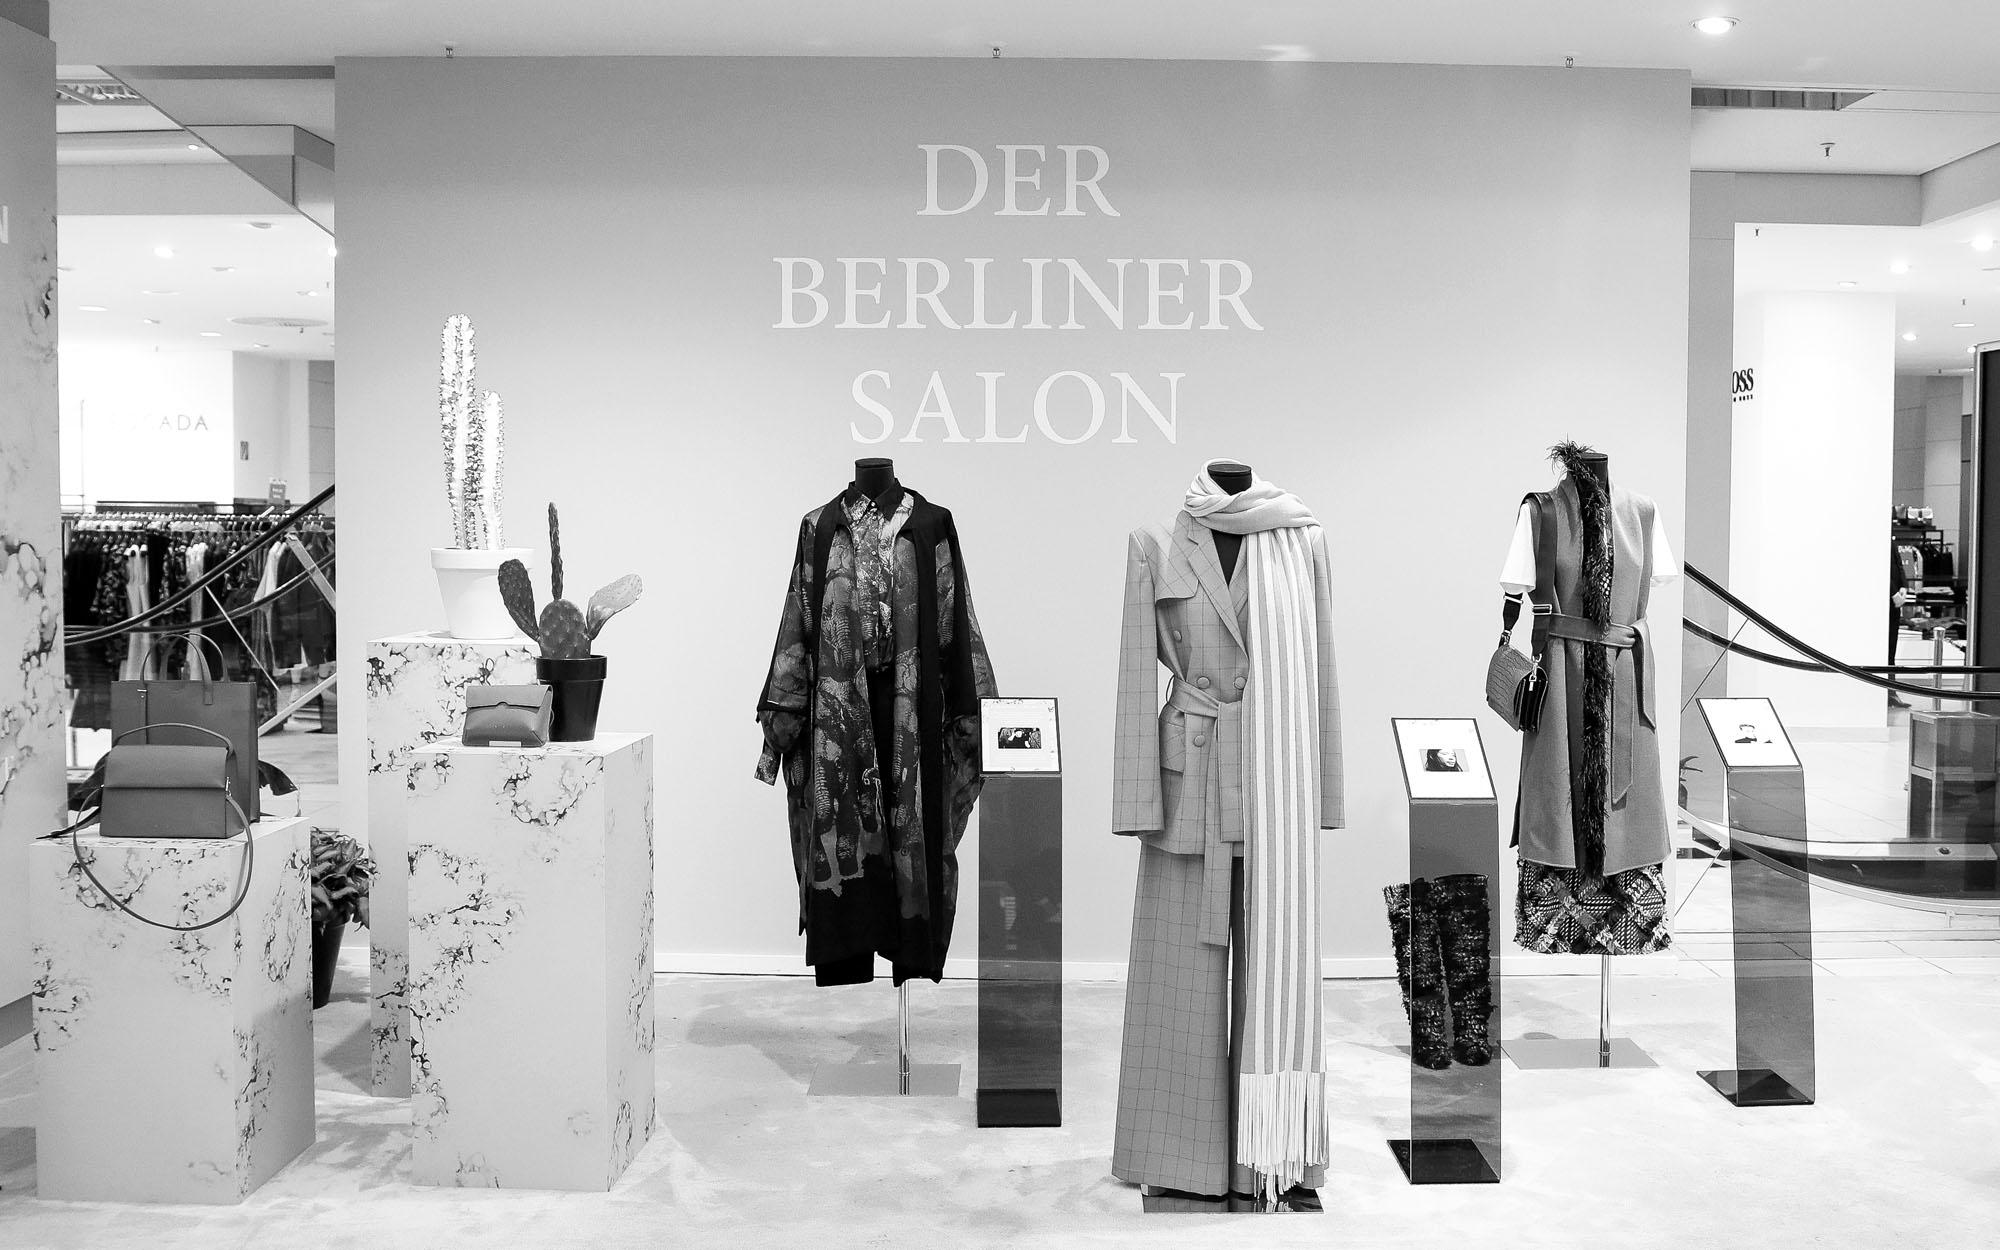 Der Berliner Salon @ KaDeWe